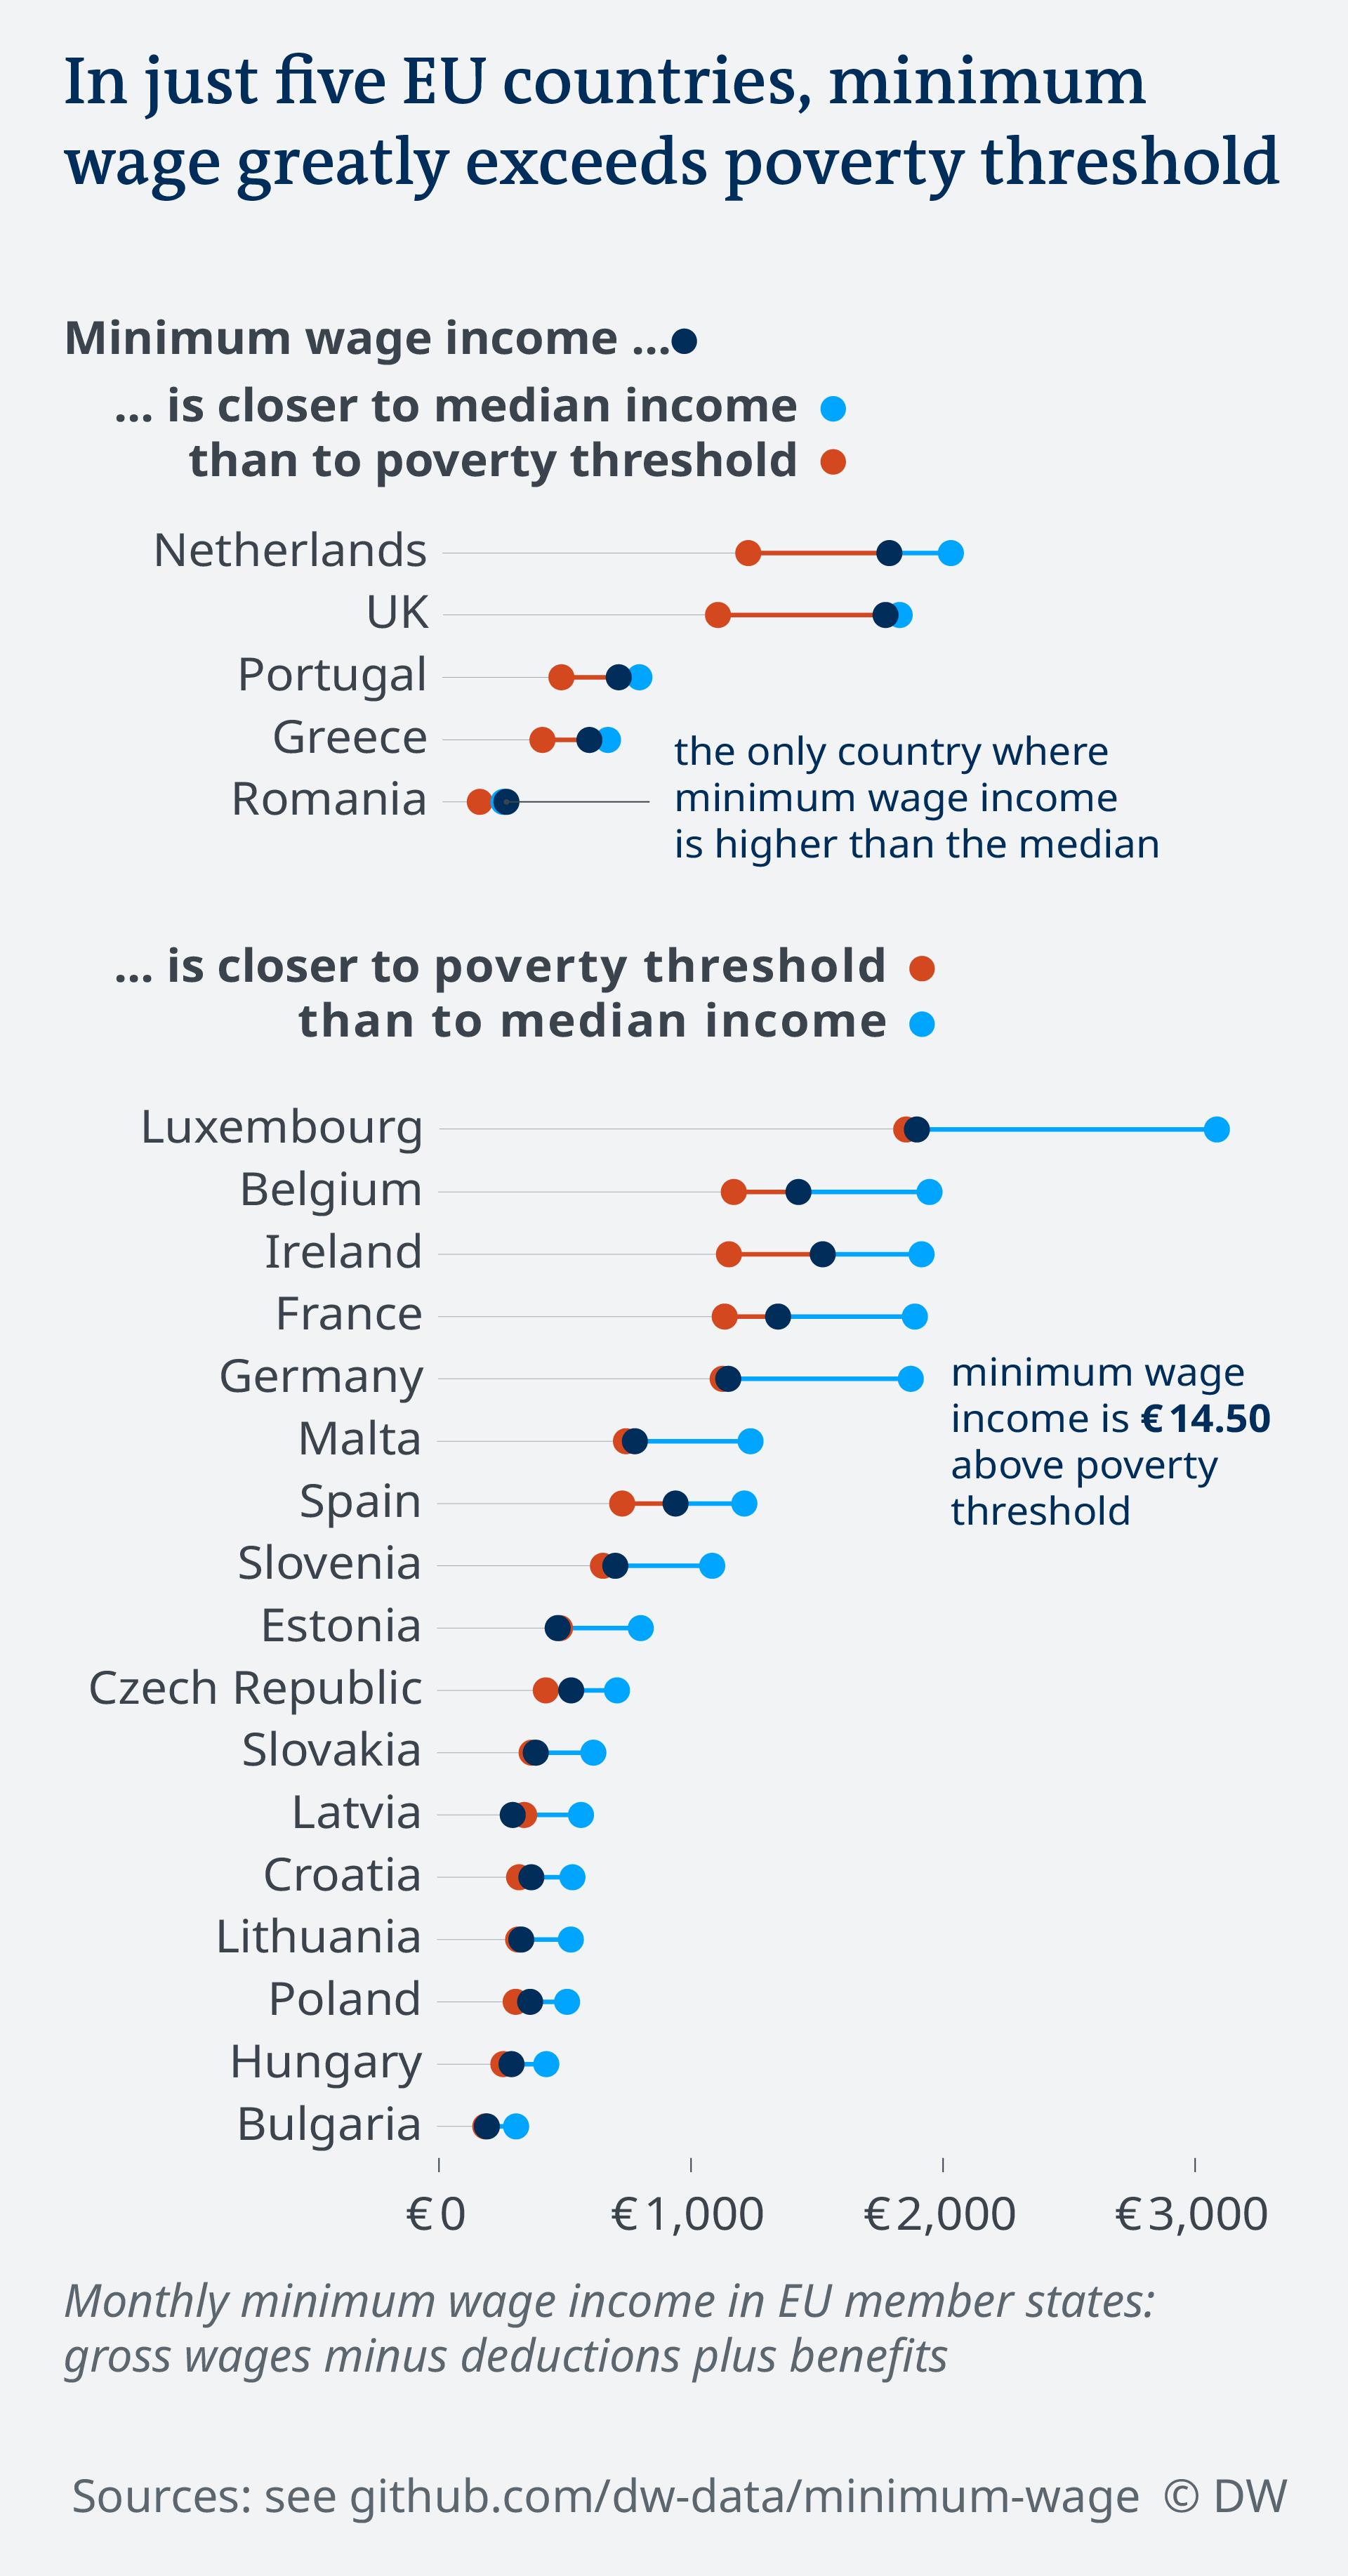 Data visualization minimum wage vs poverty threshold vs median income